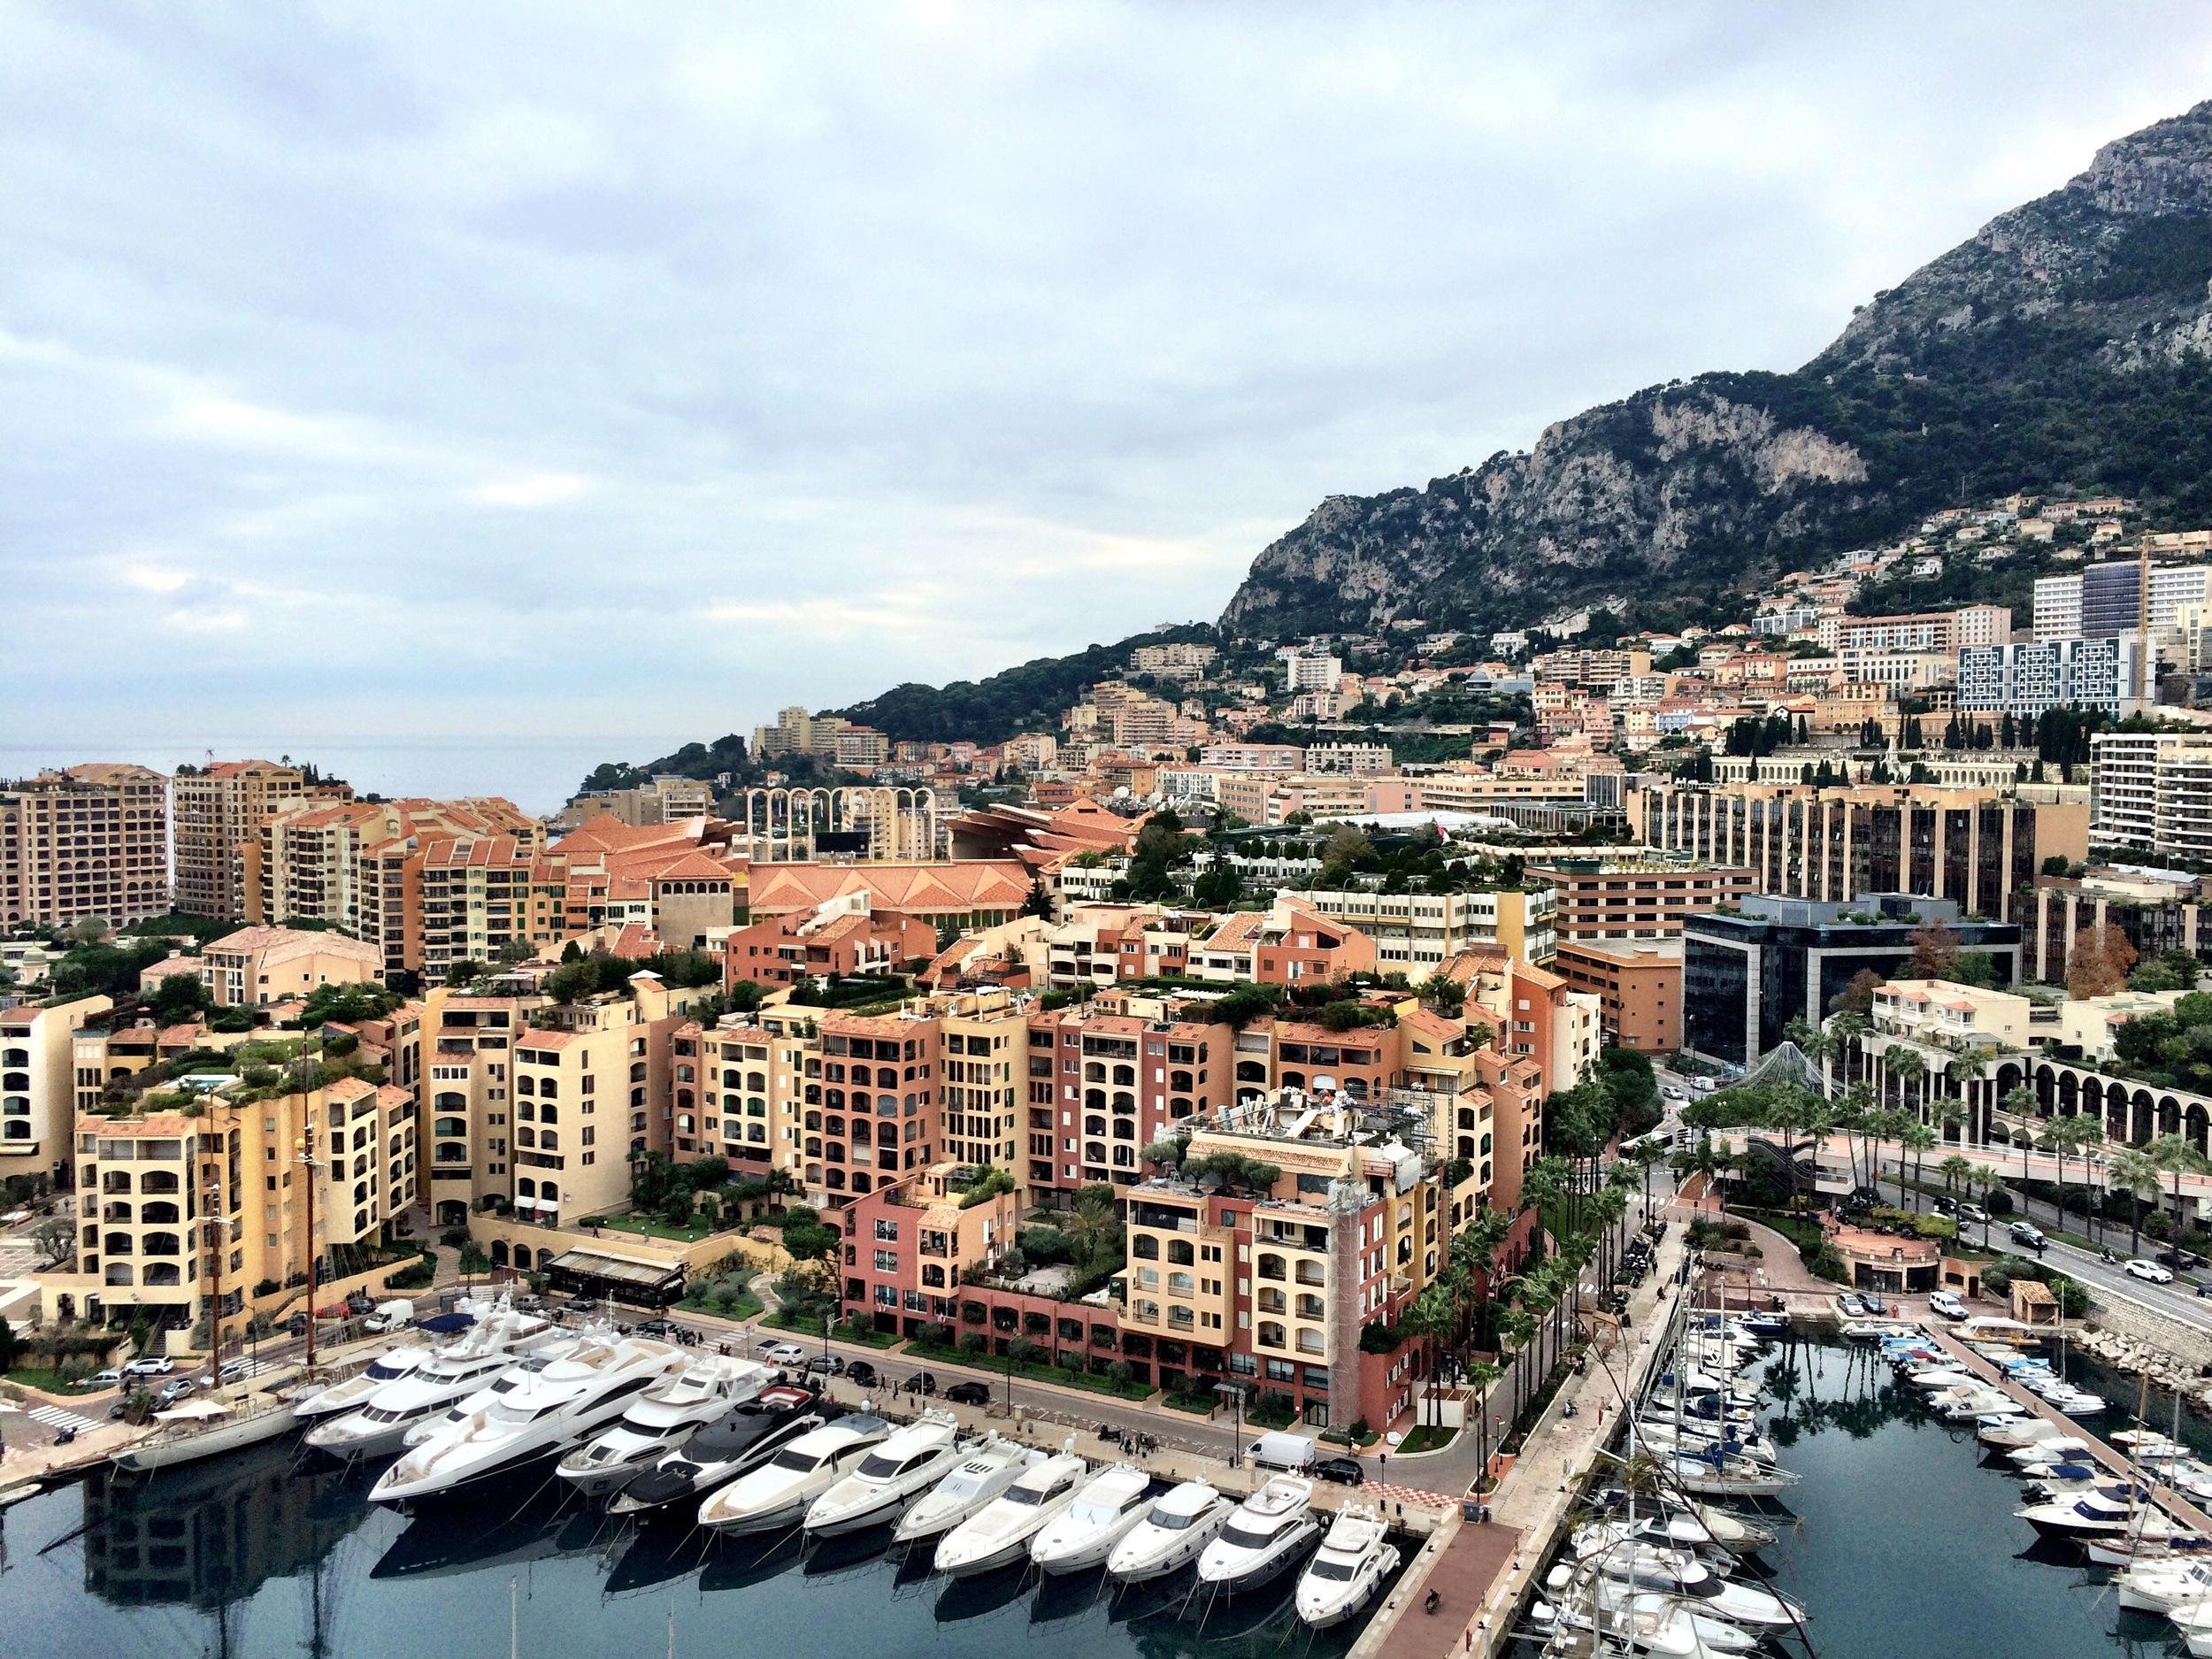 Monacoville, Monaco : November 2015